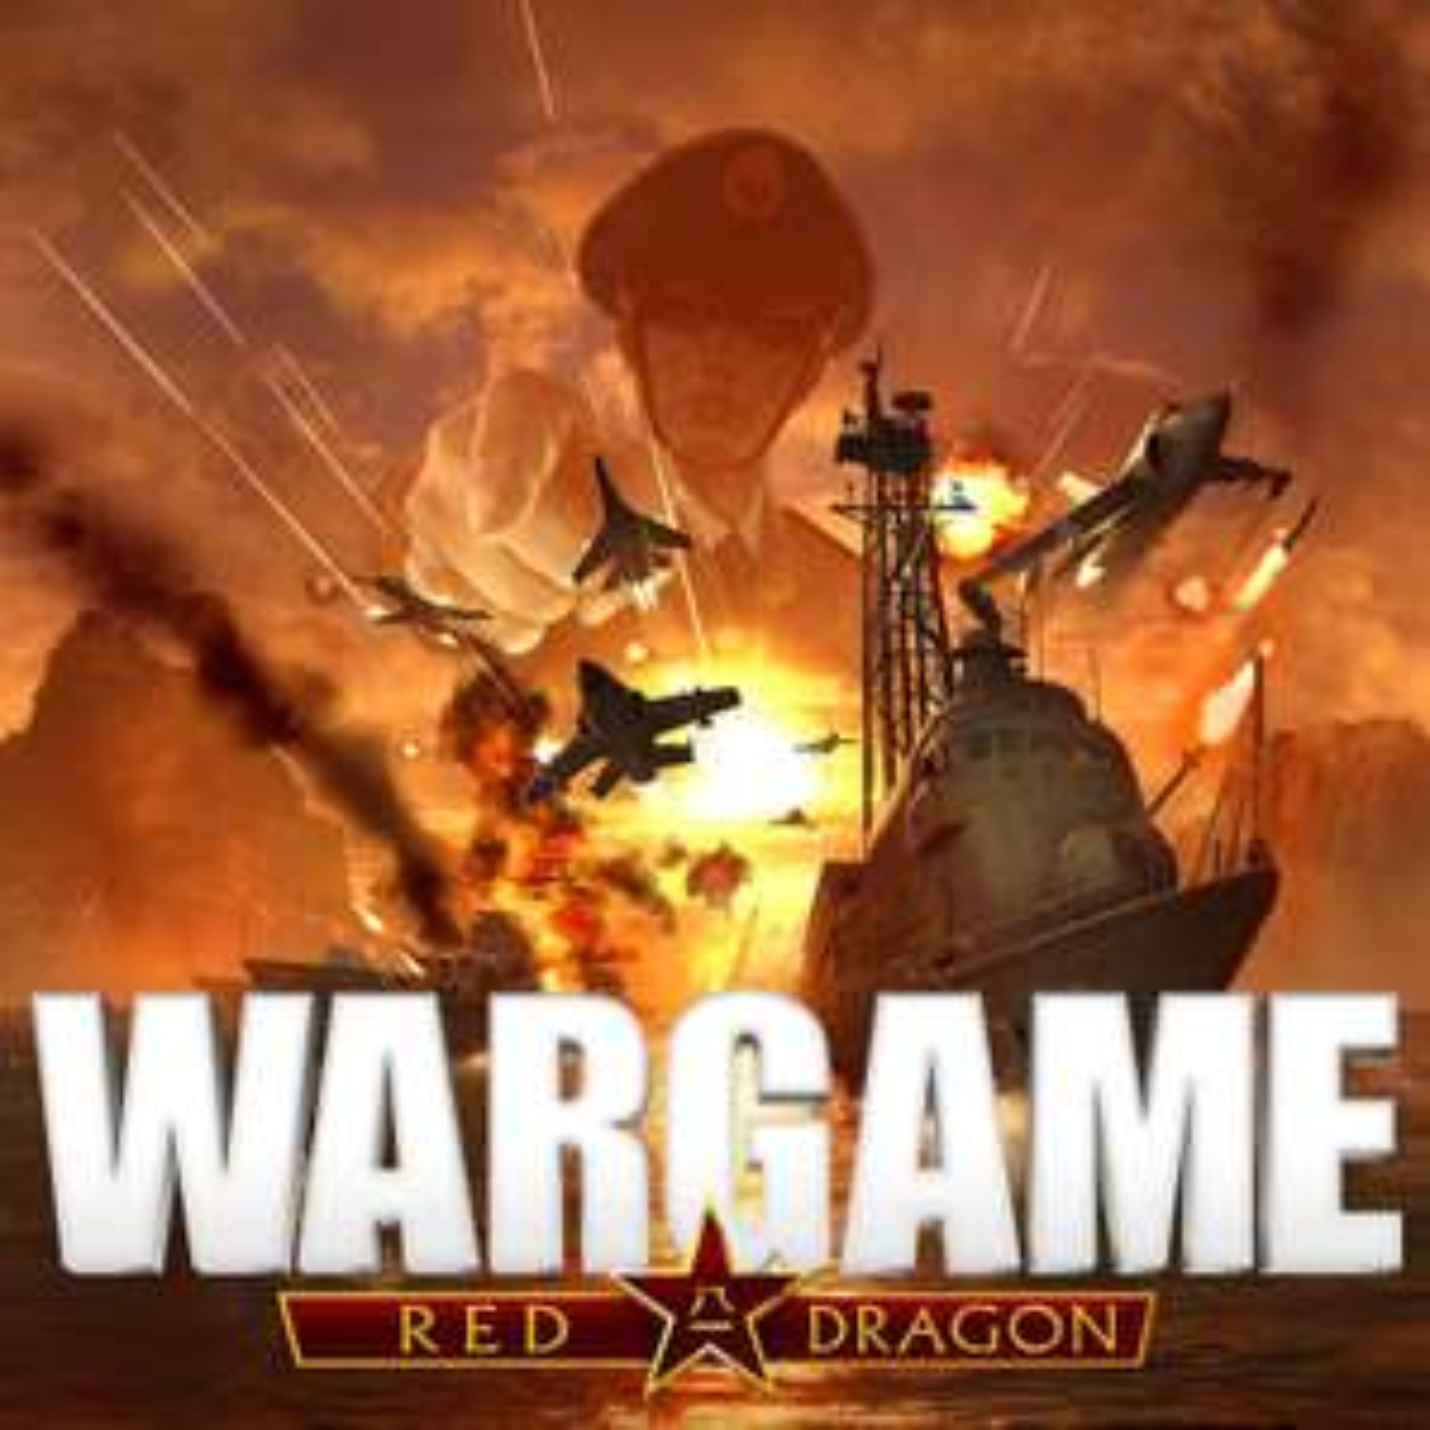 Wargame: Red Dragon - Kostenlos via Epic Games (04.03 - 11.03)